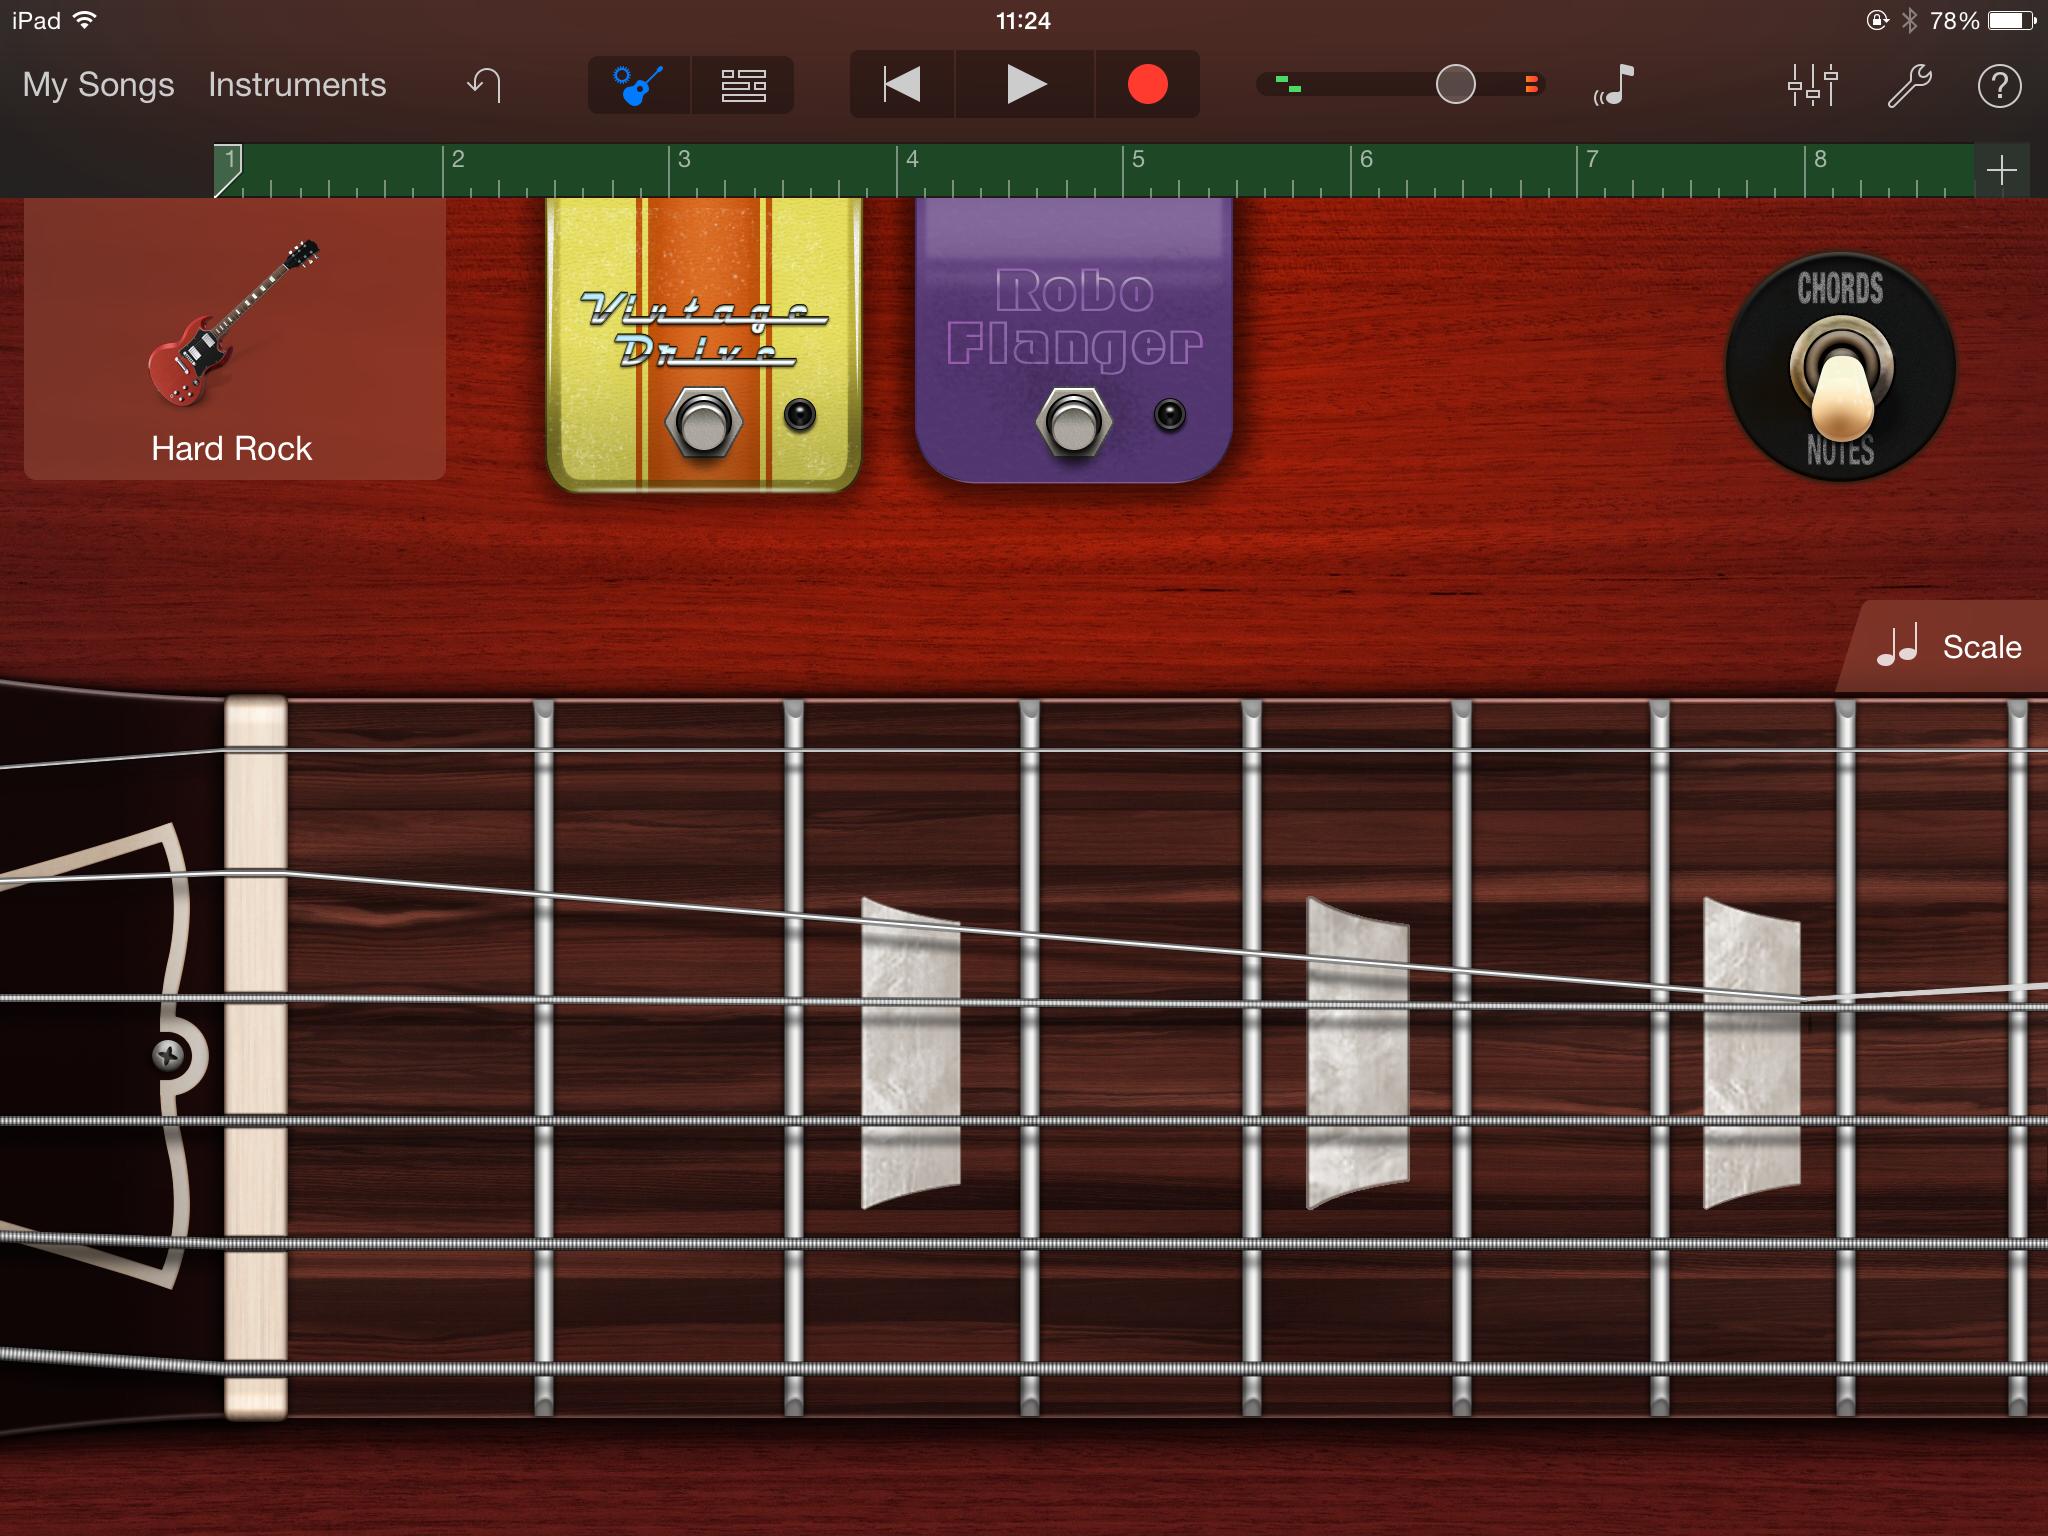 Piano Garage Band : Garageband tutorial how to use garageband on ipad iphone den